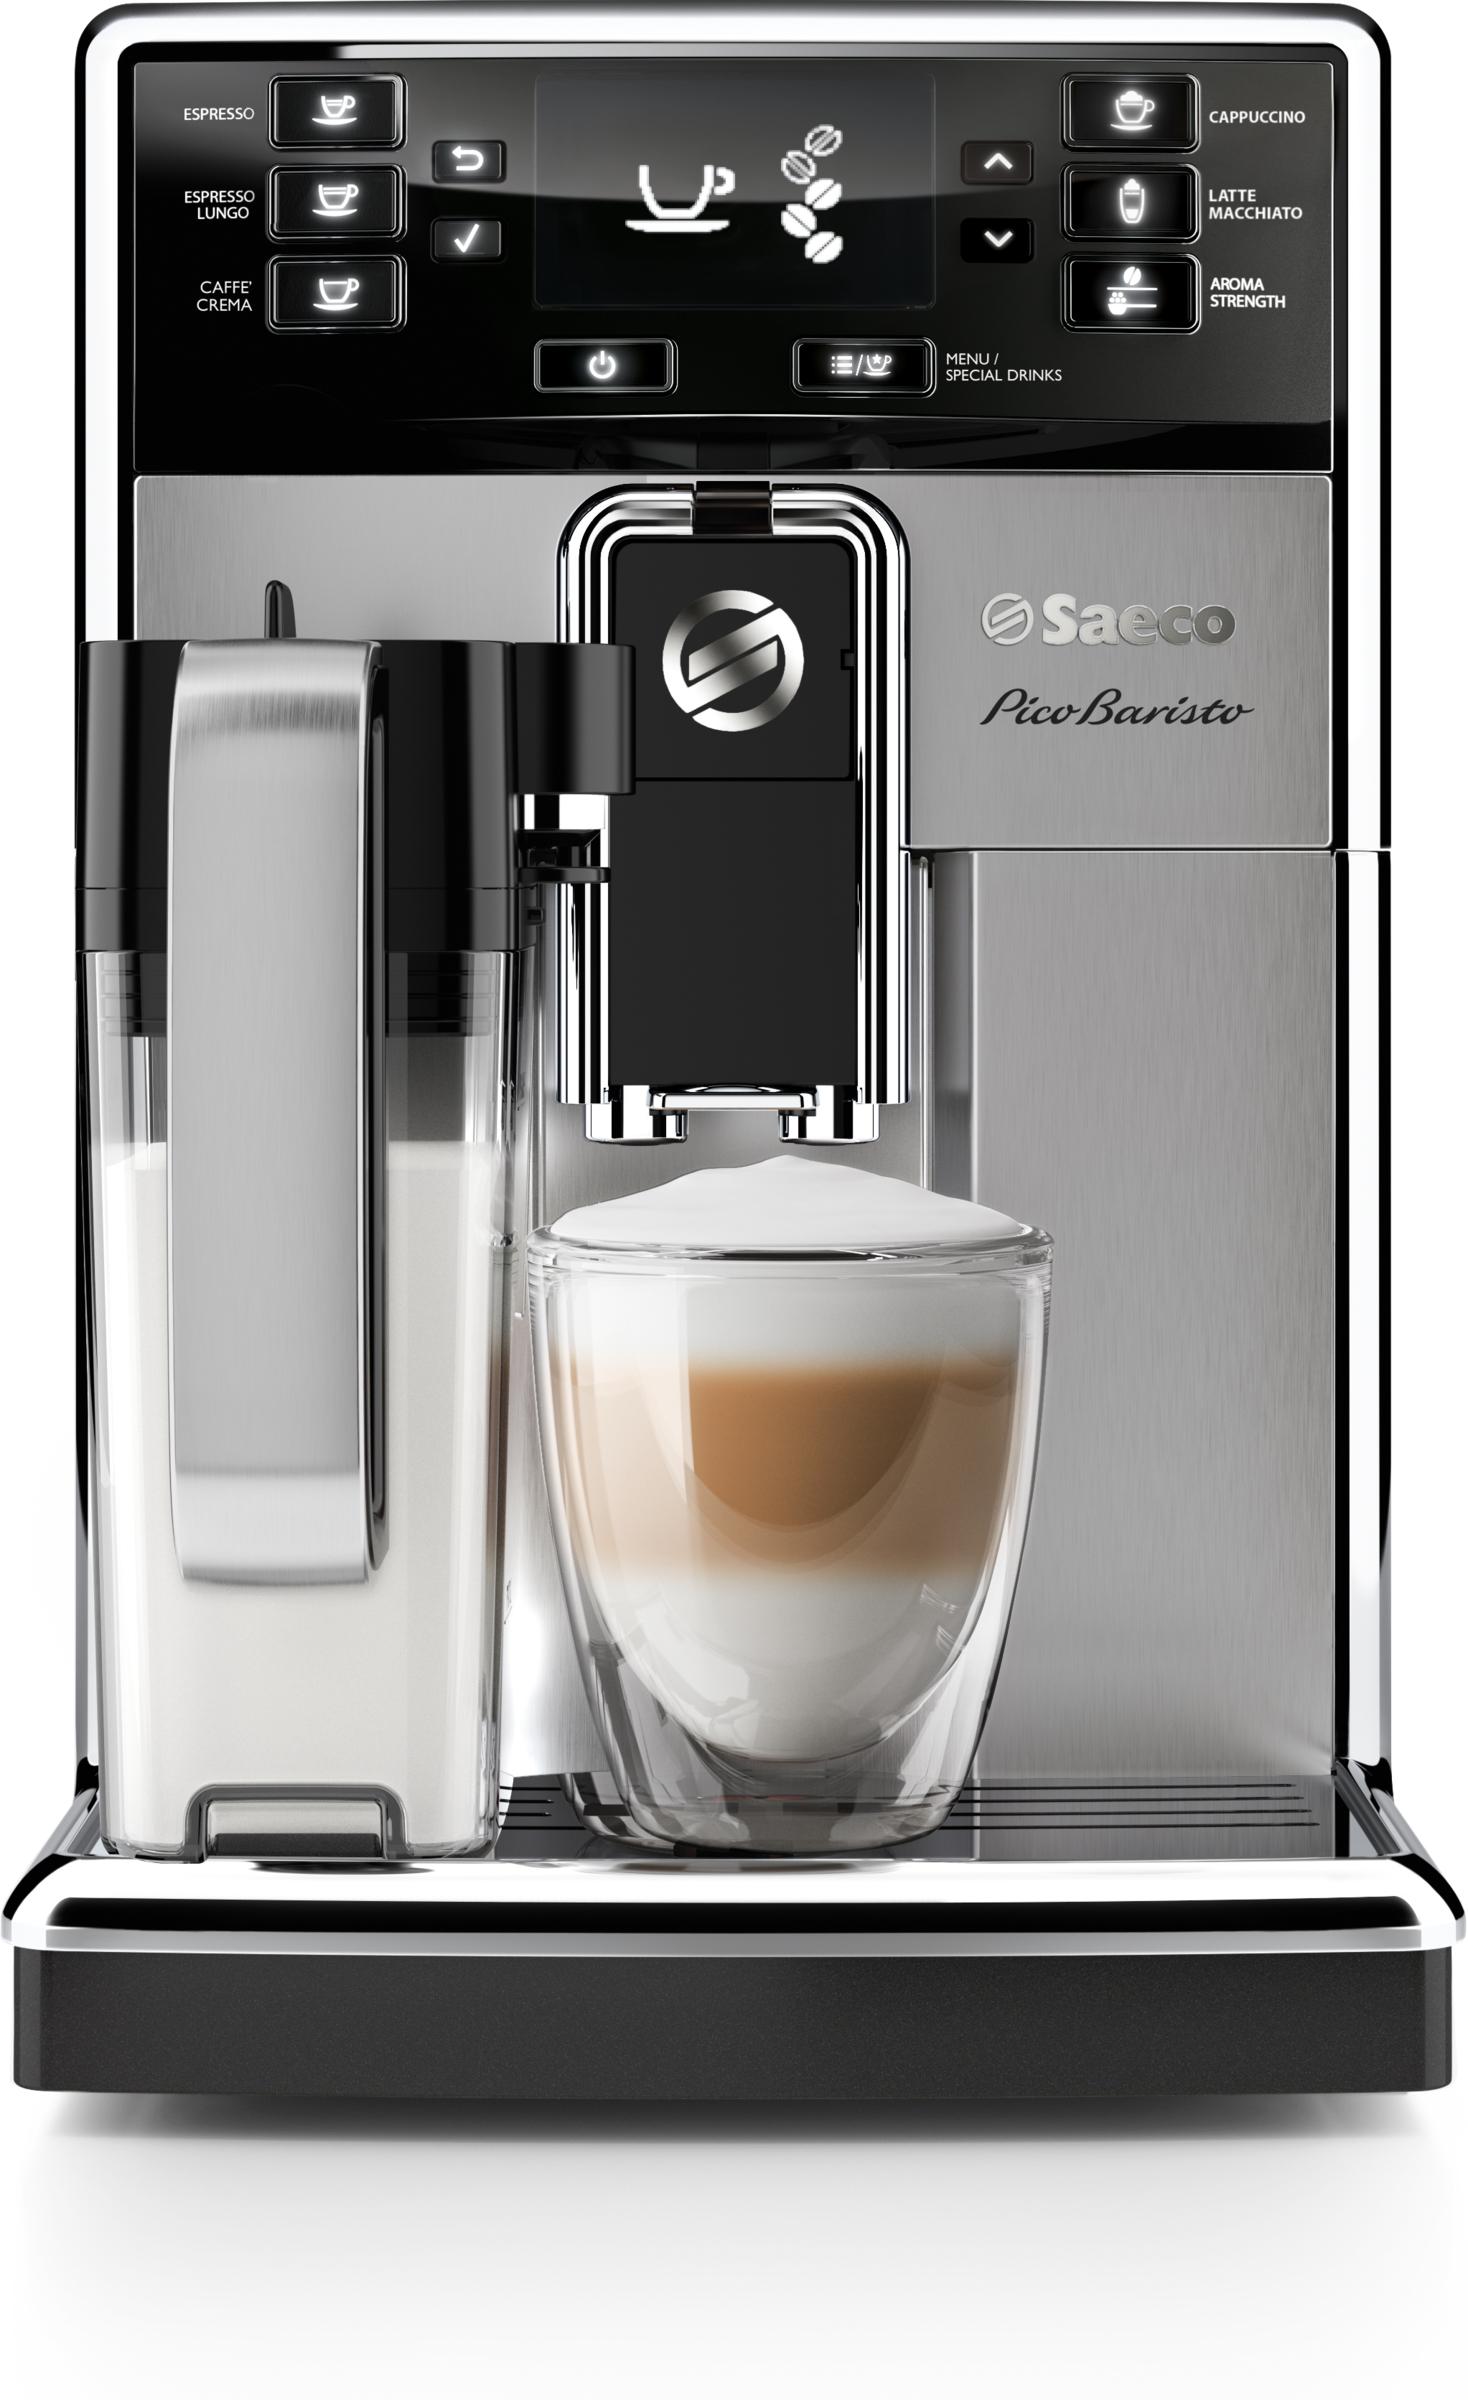 Saeco PicoBaristo HD8928/09 кофемашина кофемашина jura a9 aluminium 15118 1450вт 15бар автокапуч